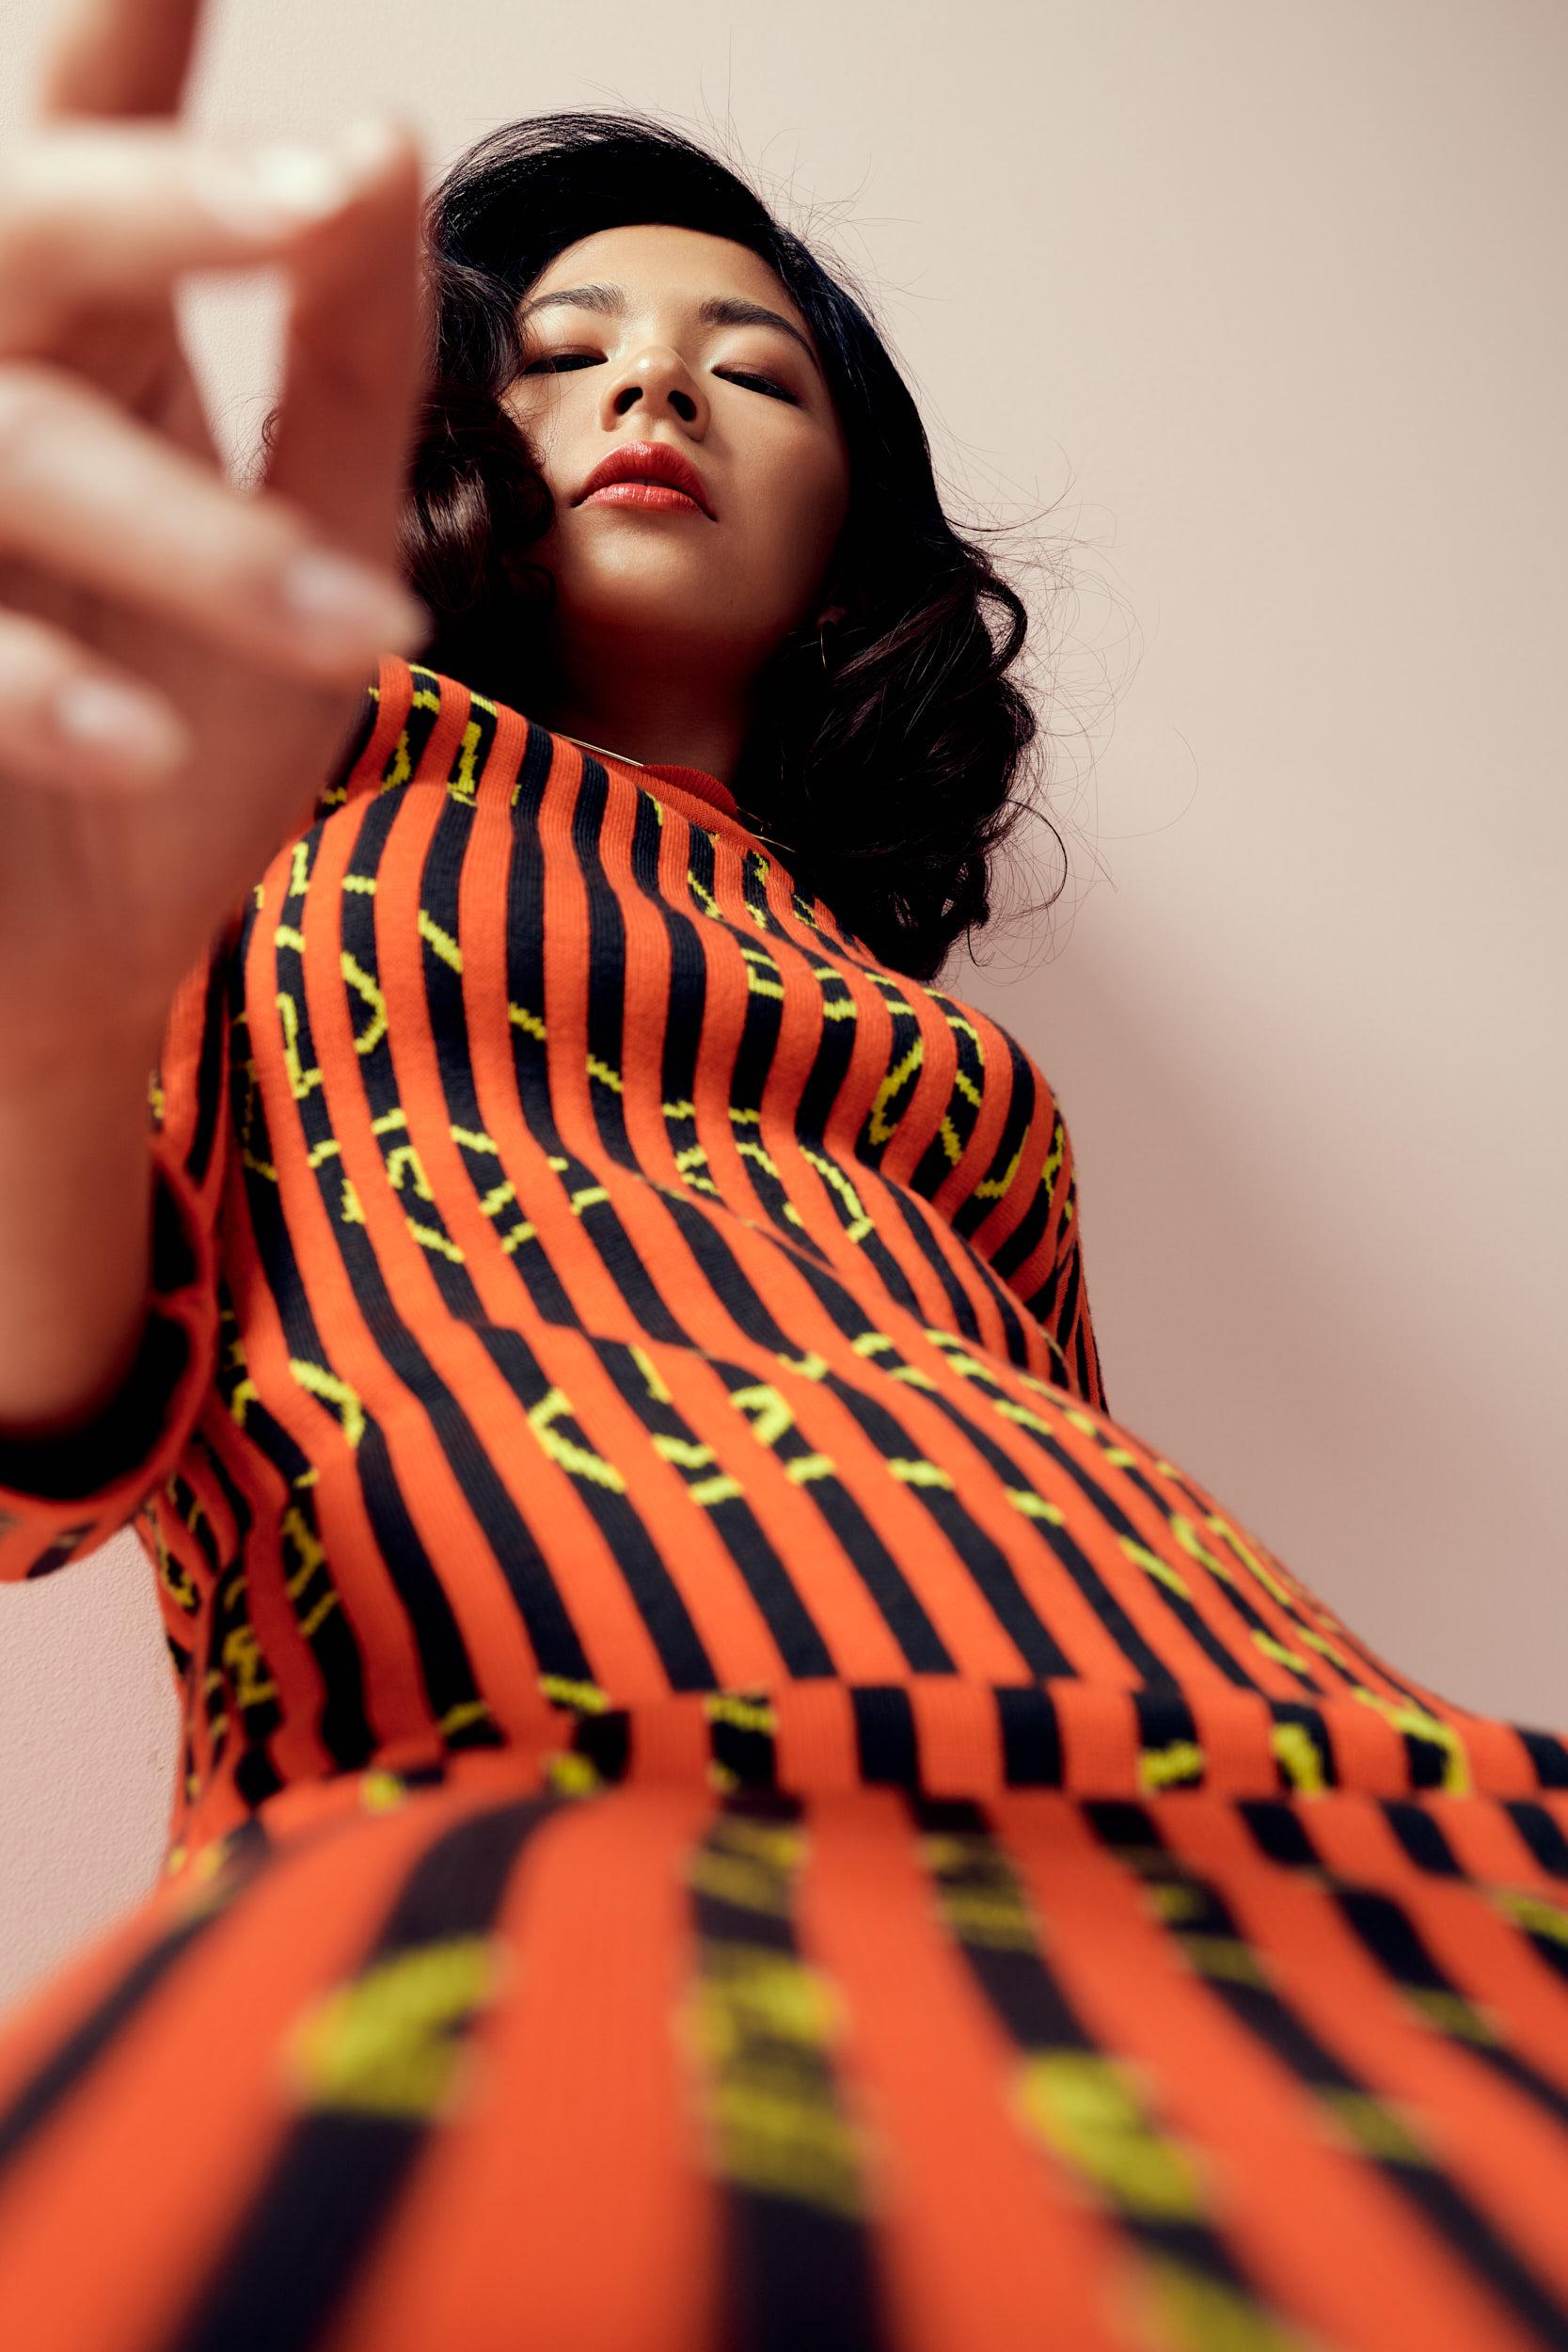 Joe Friend Photography | Fashion Photography | Goldie & Bob Salon